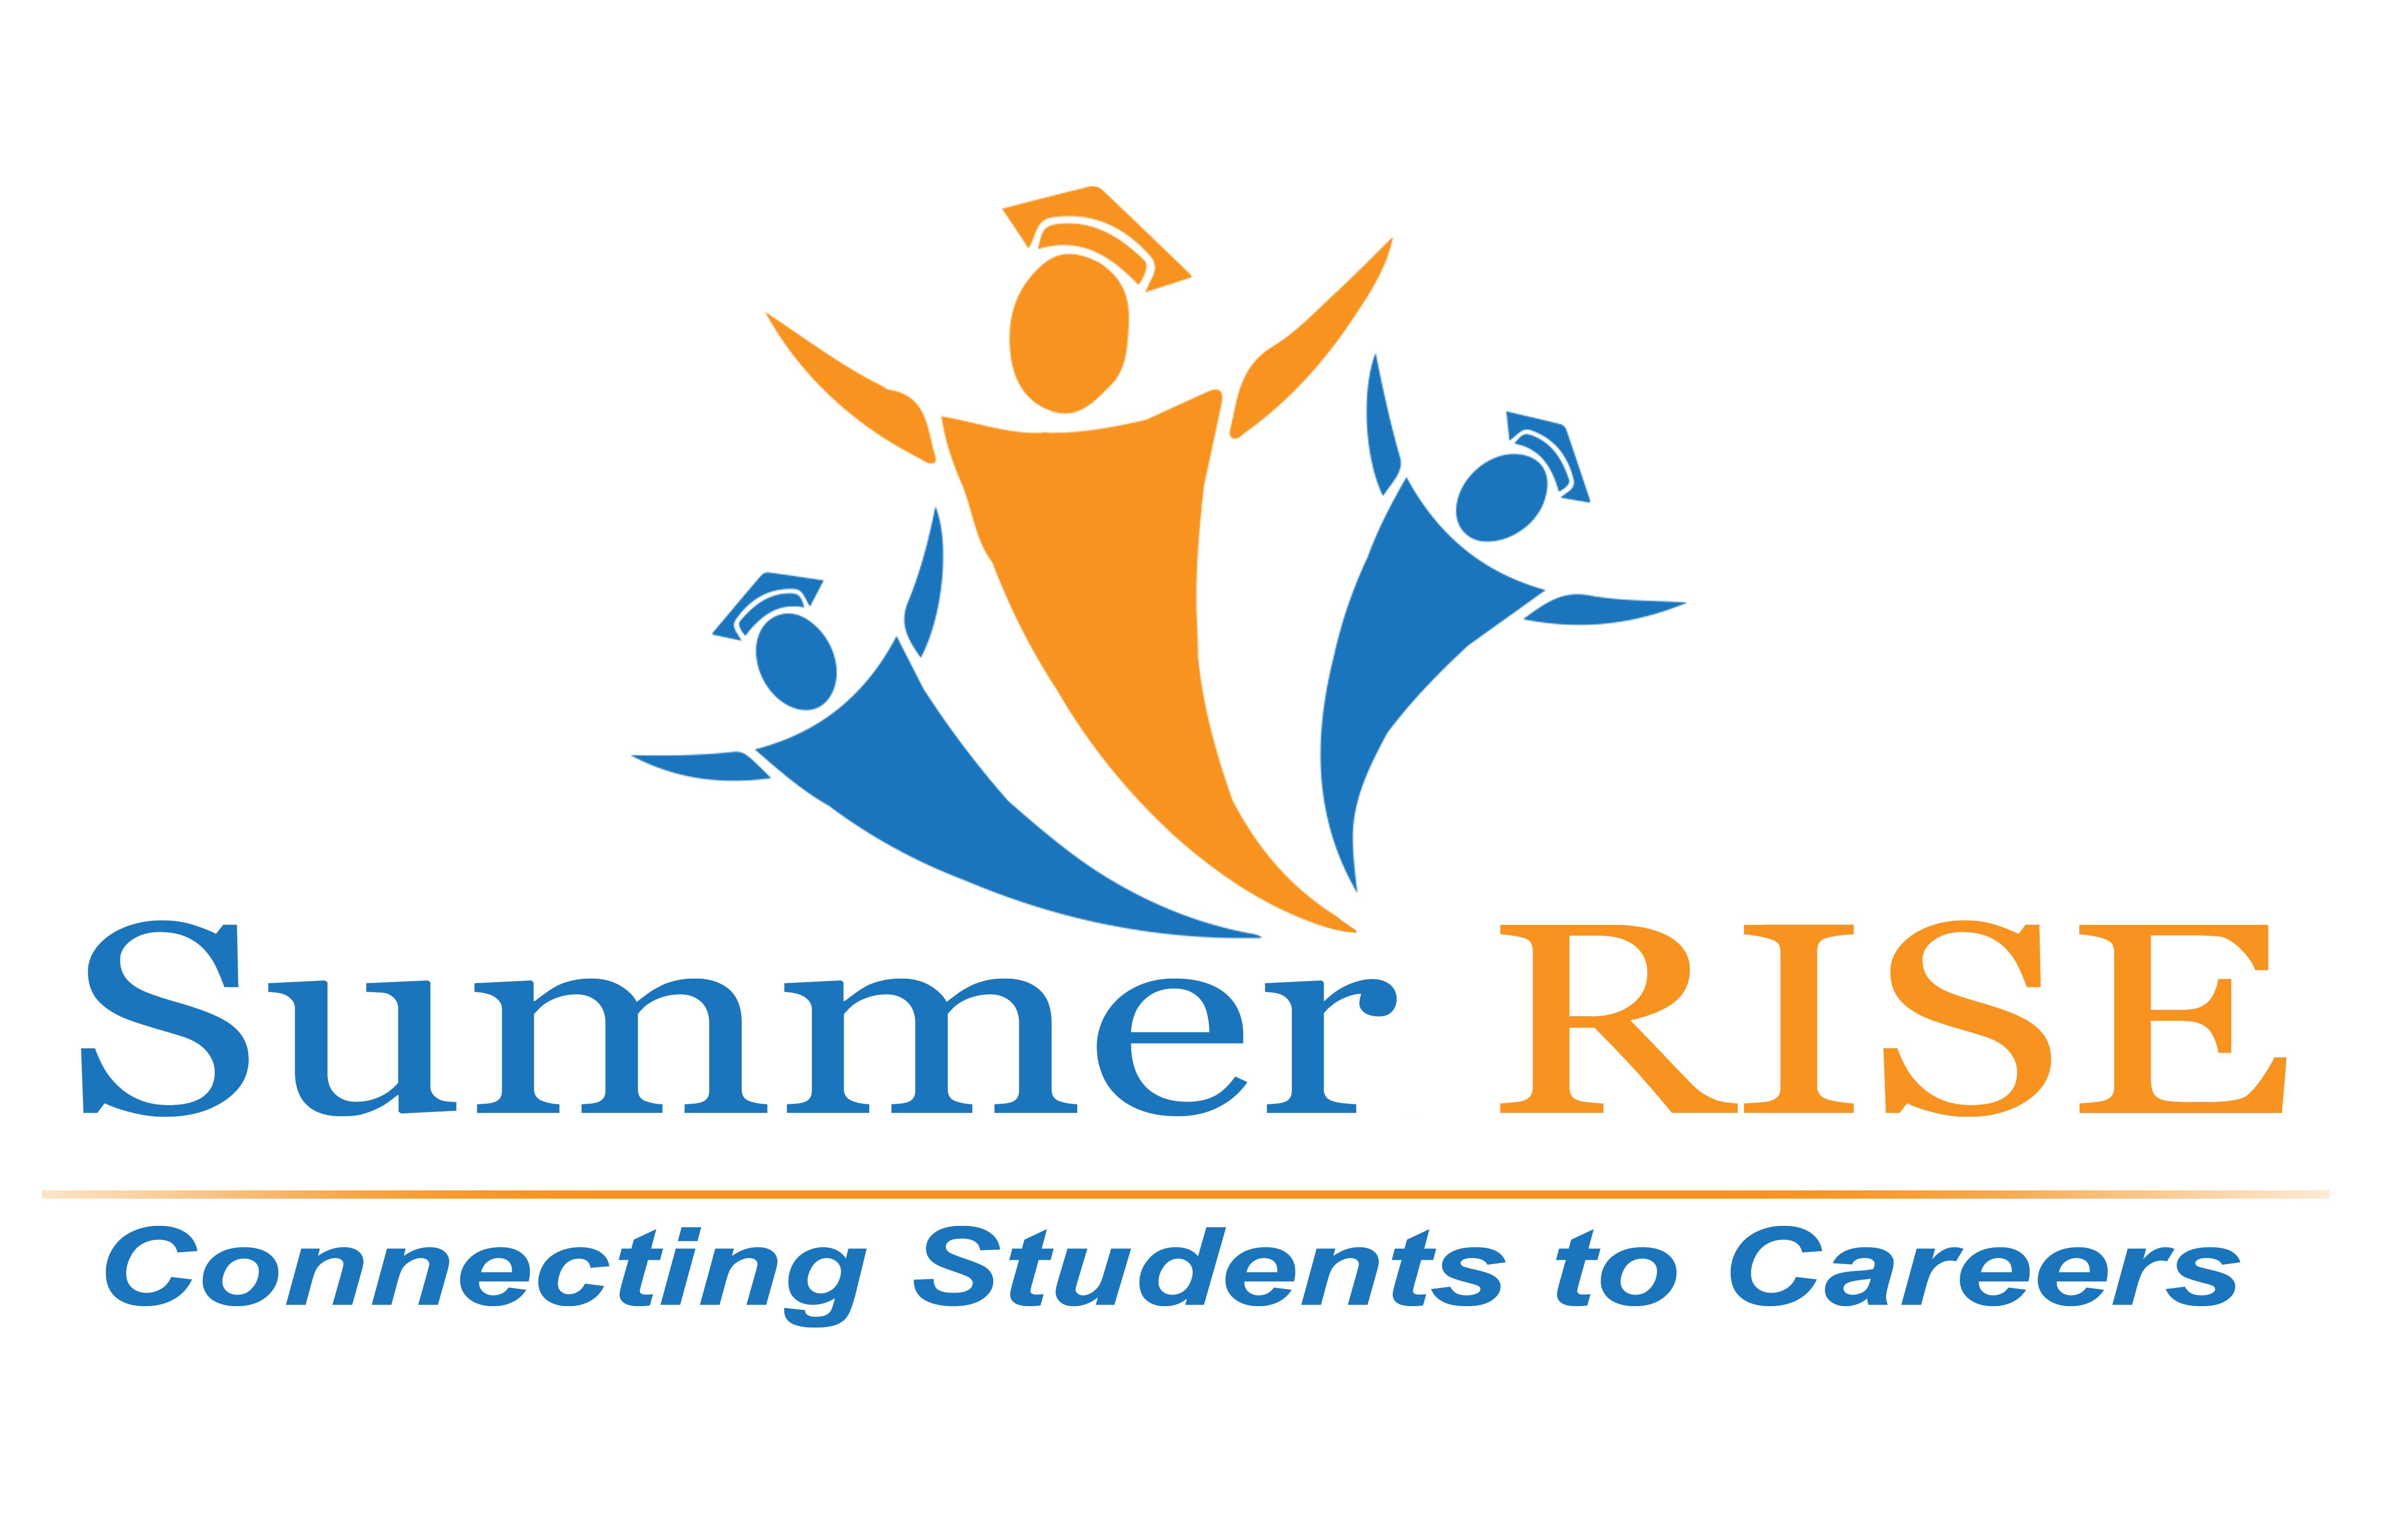 summer rise logo